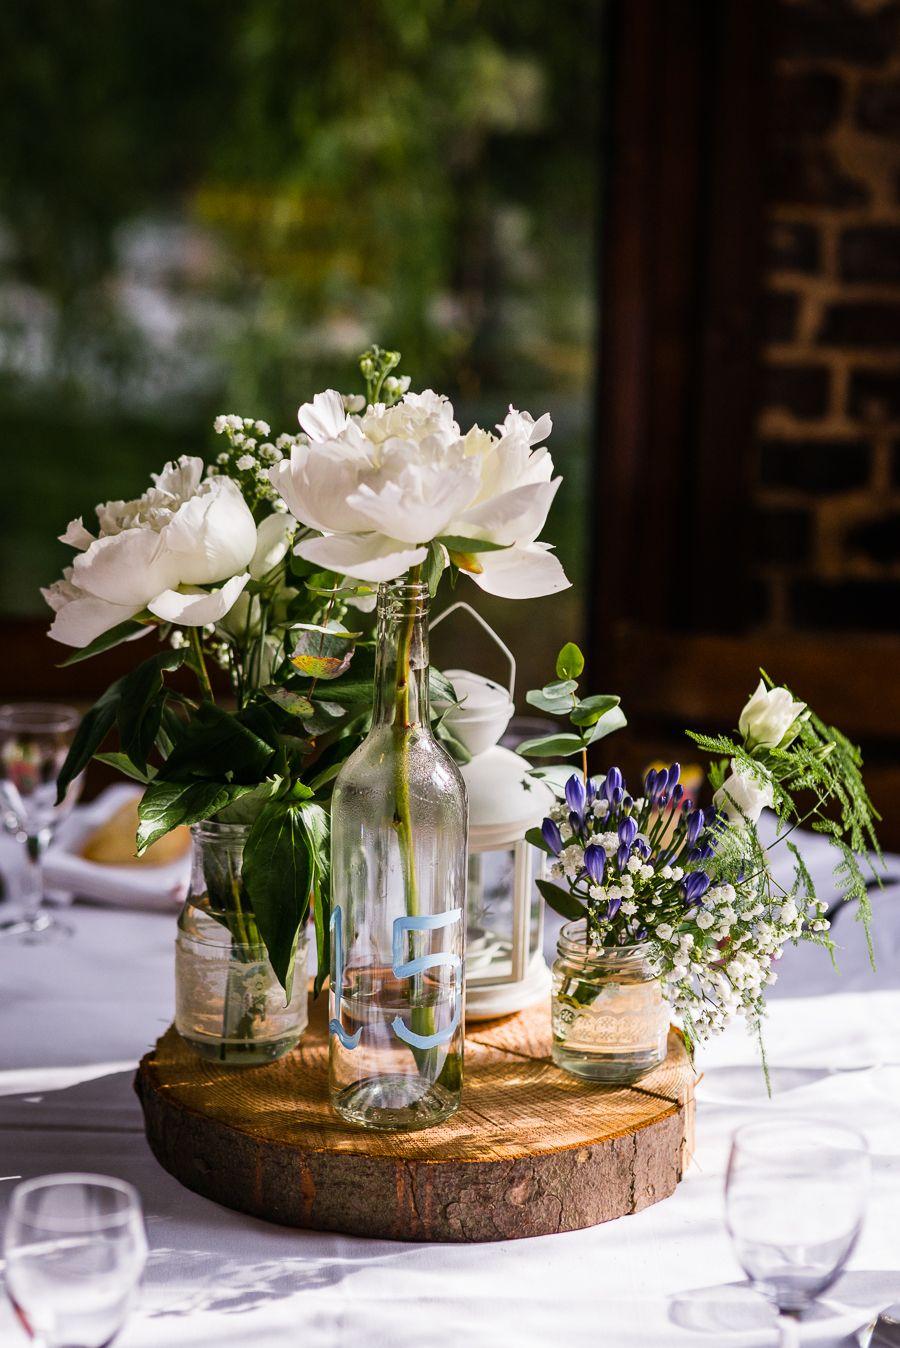 Deco Centre De Table centre de table fleuri …   deco mariage, centre de table